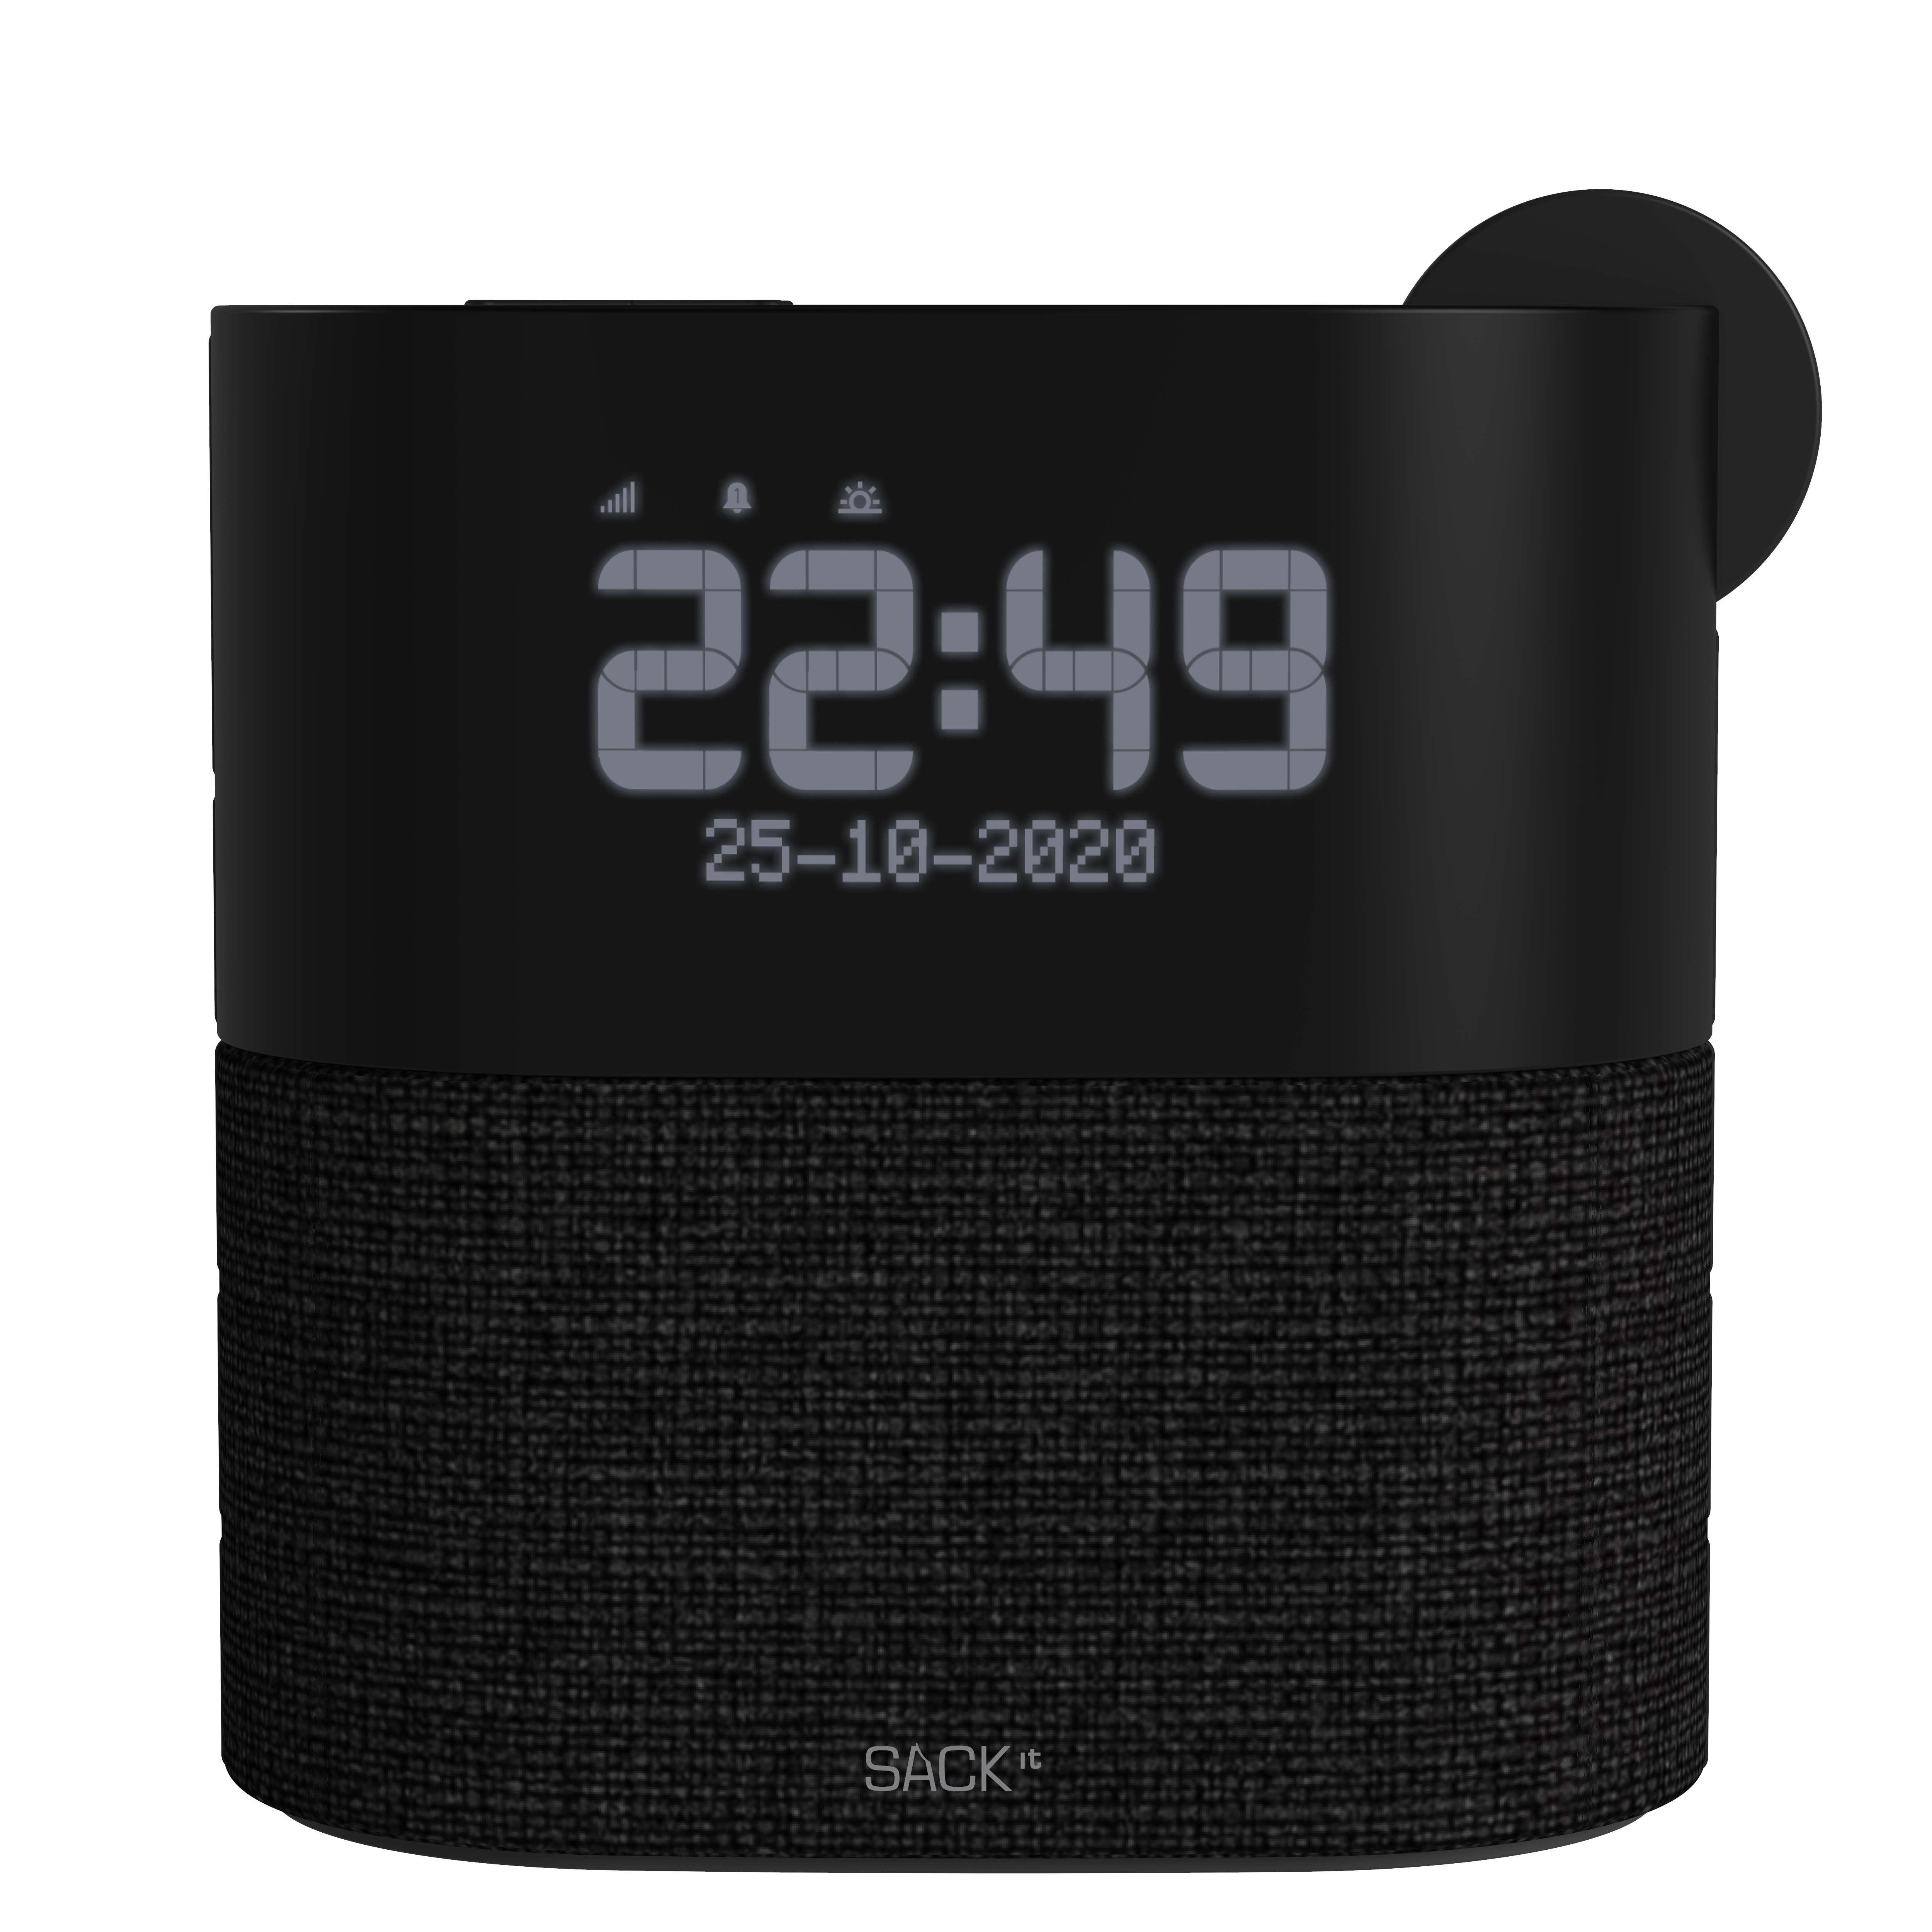 SACKit - WAKEit S - Clock Radio - Black